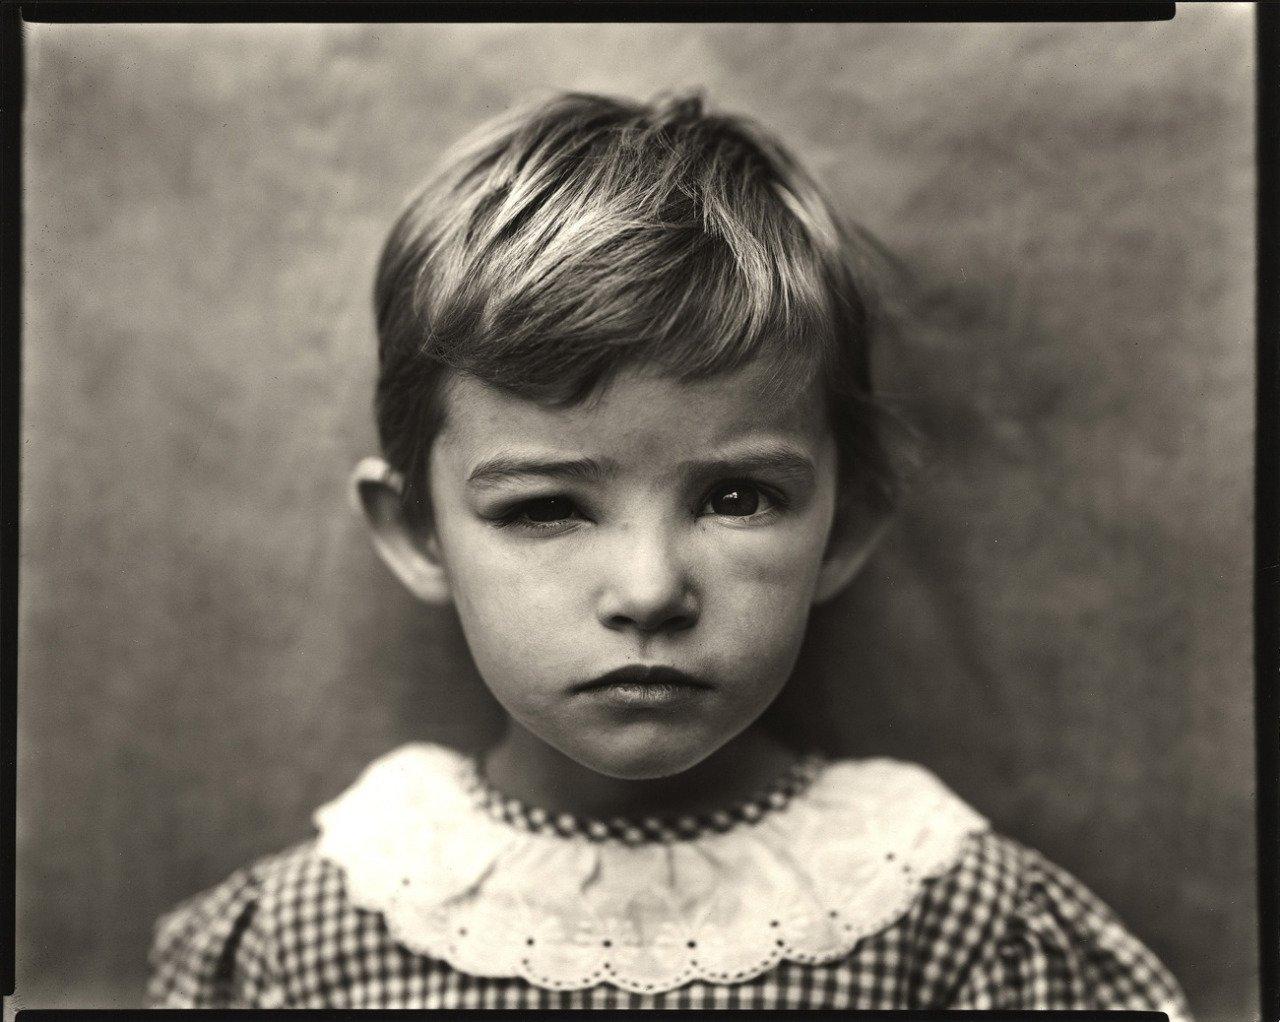 Damaged Child, 1984 © Sally Mann